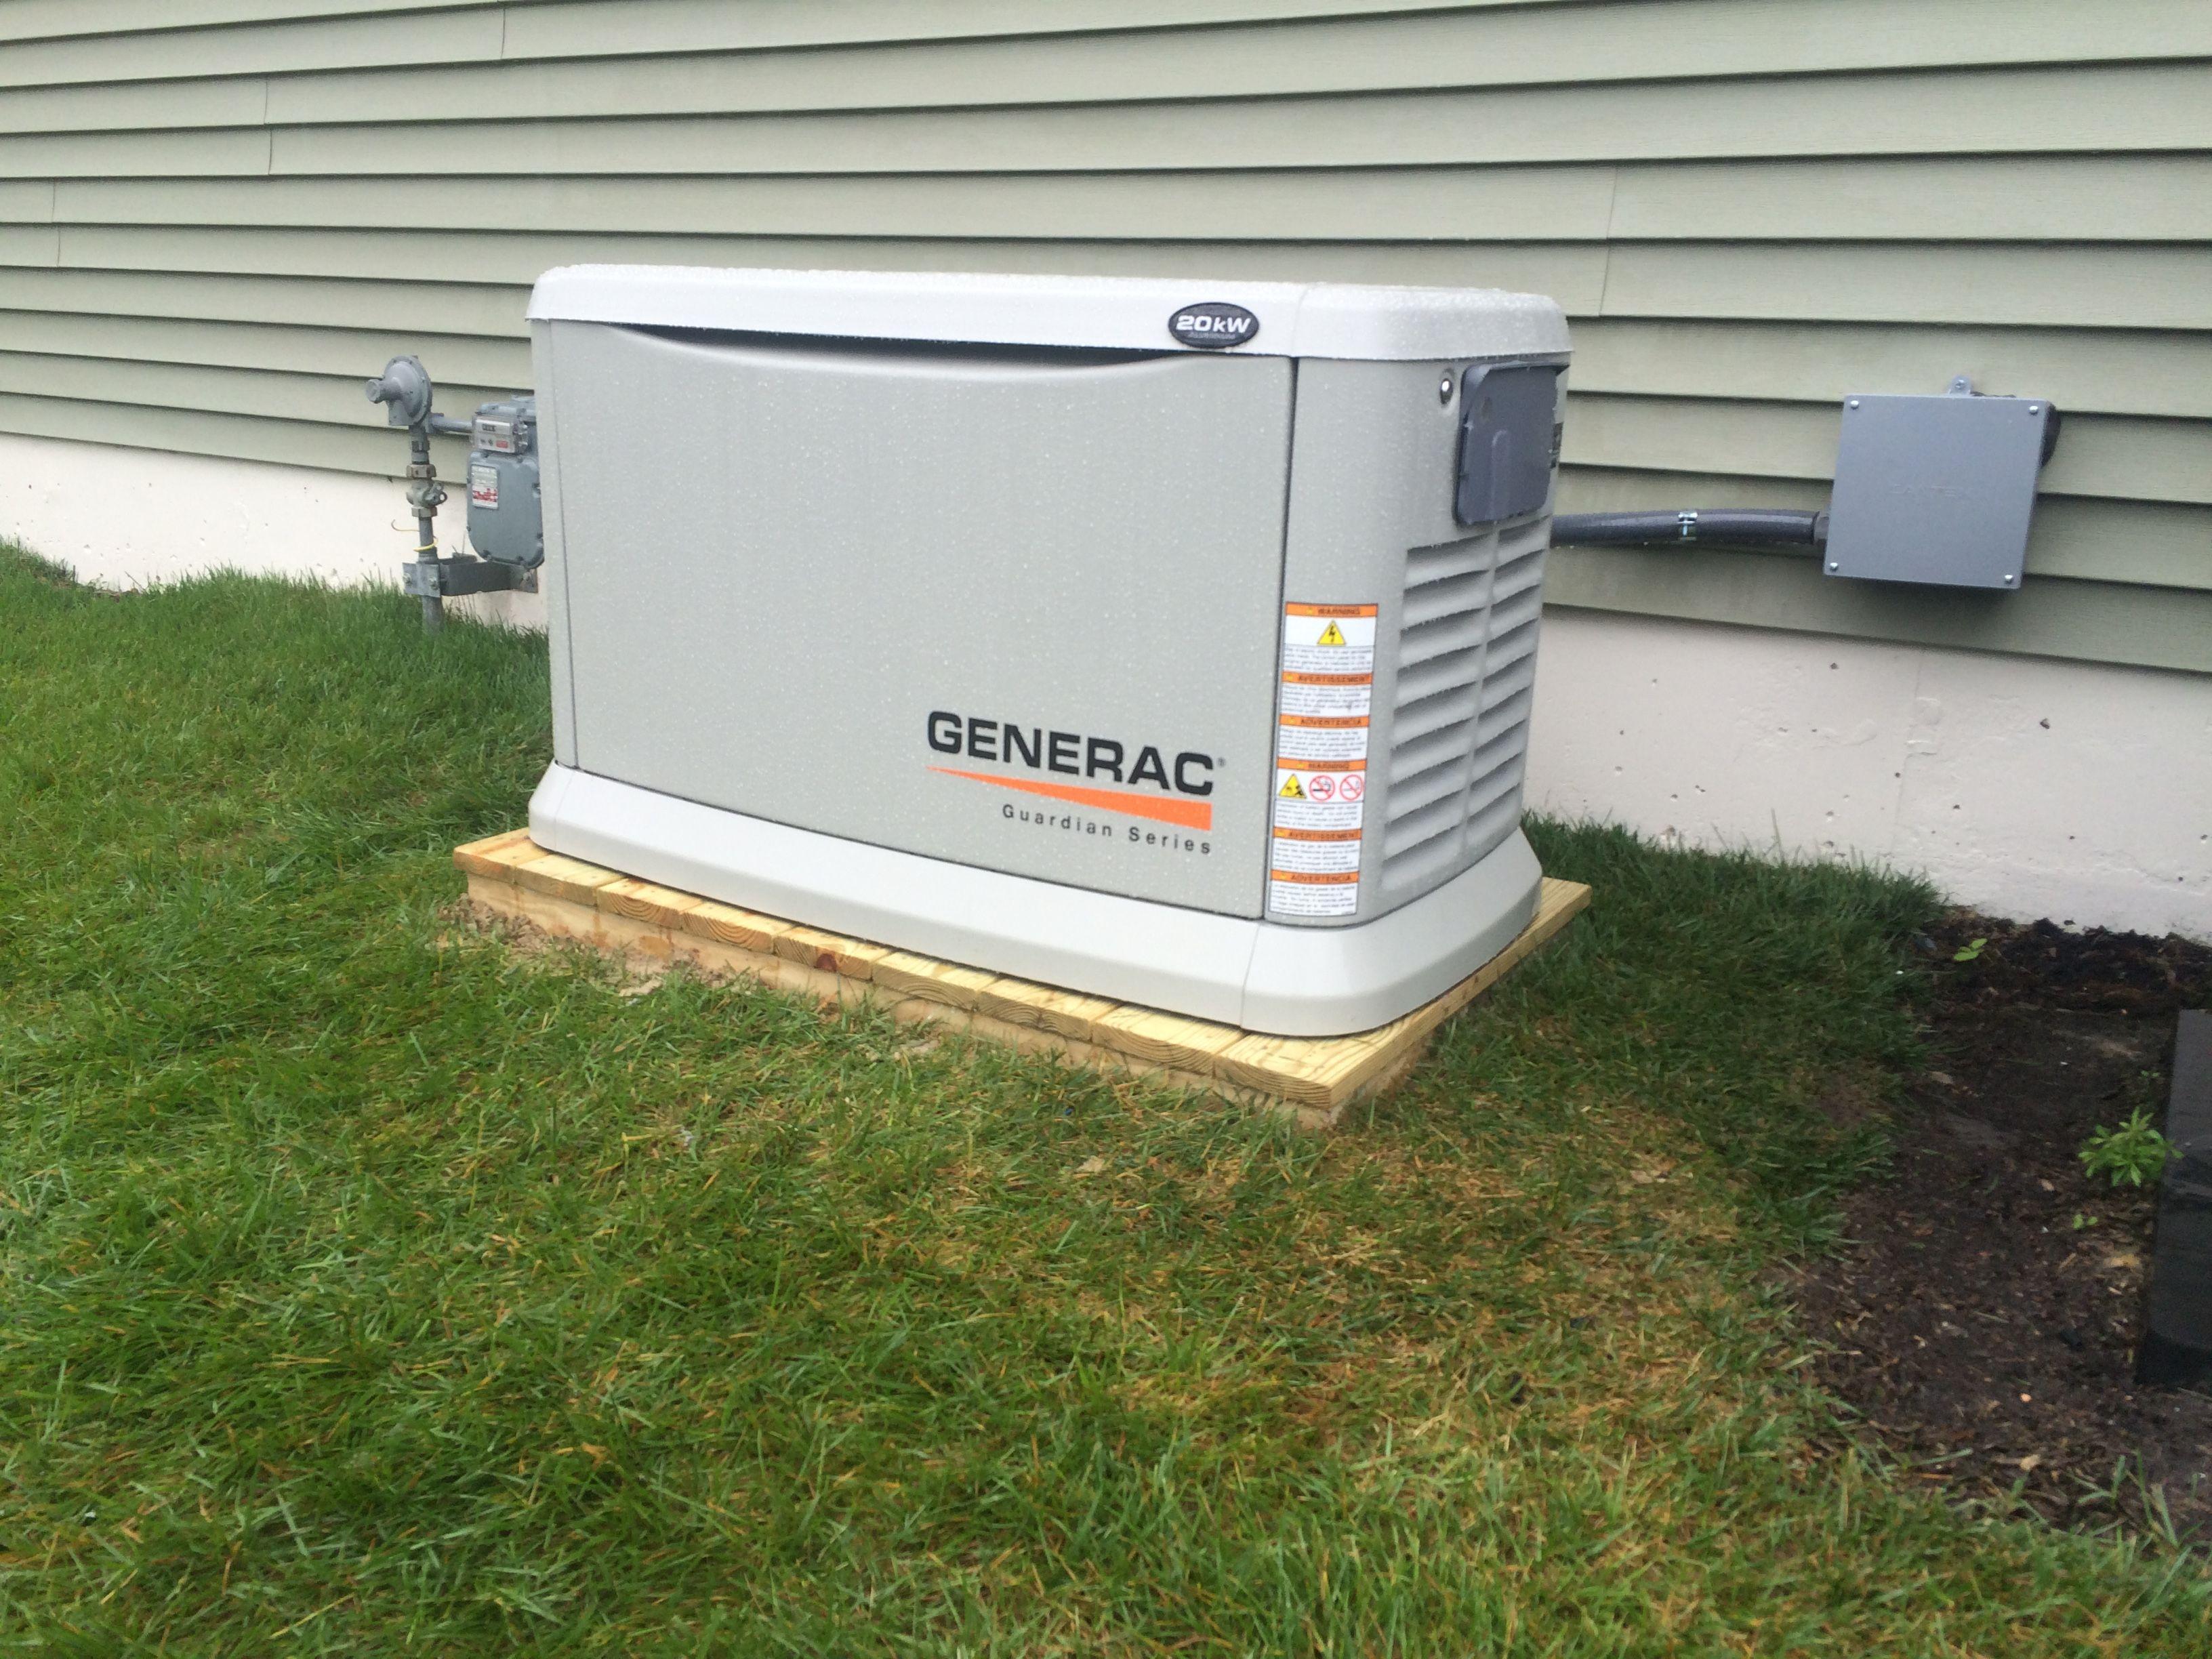 20kw Generac Generator On A Salt Treated Platform Installation Home Appliances Washing Machine